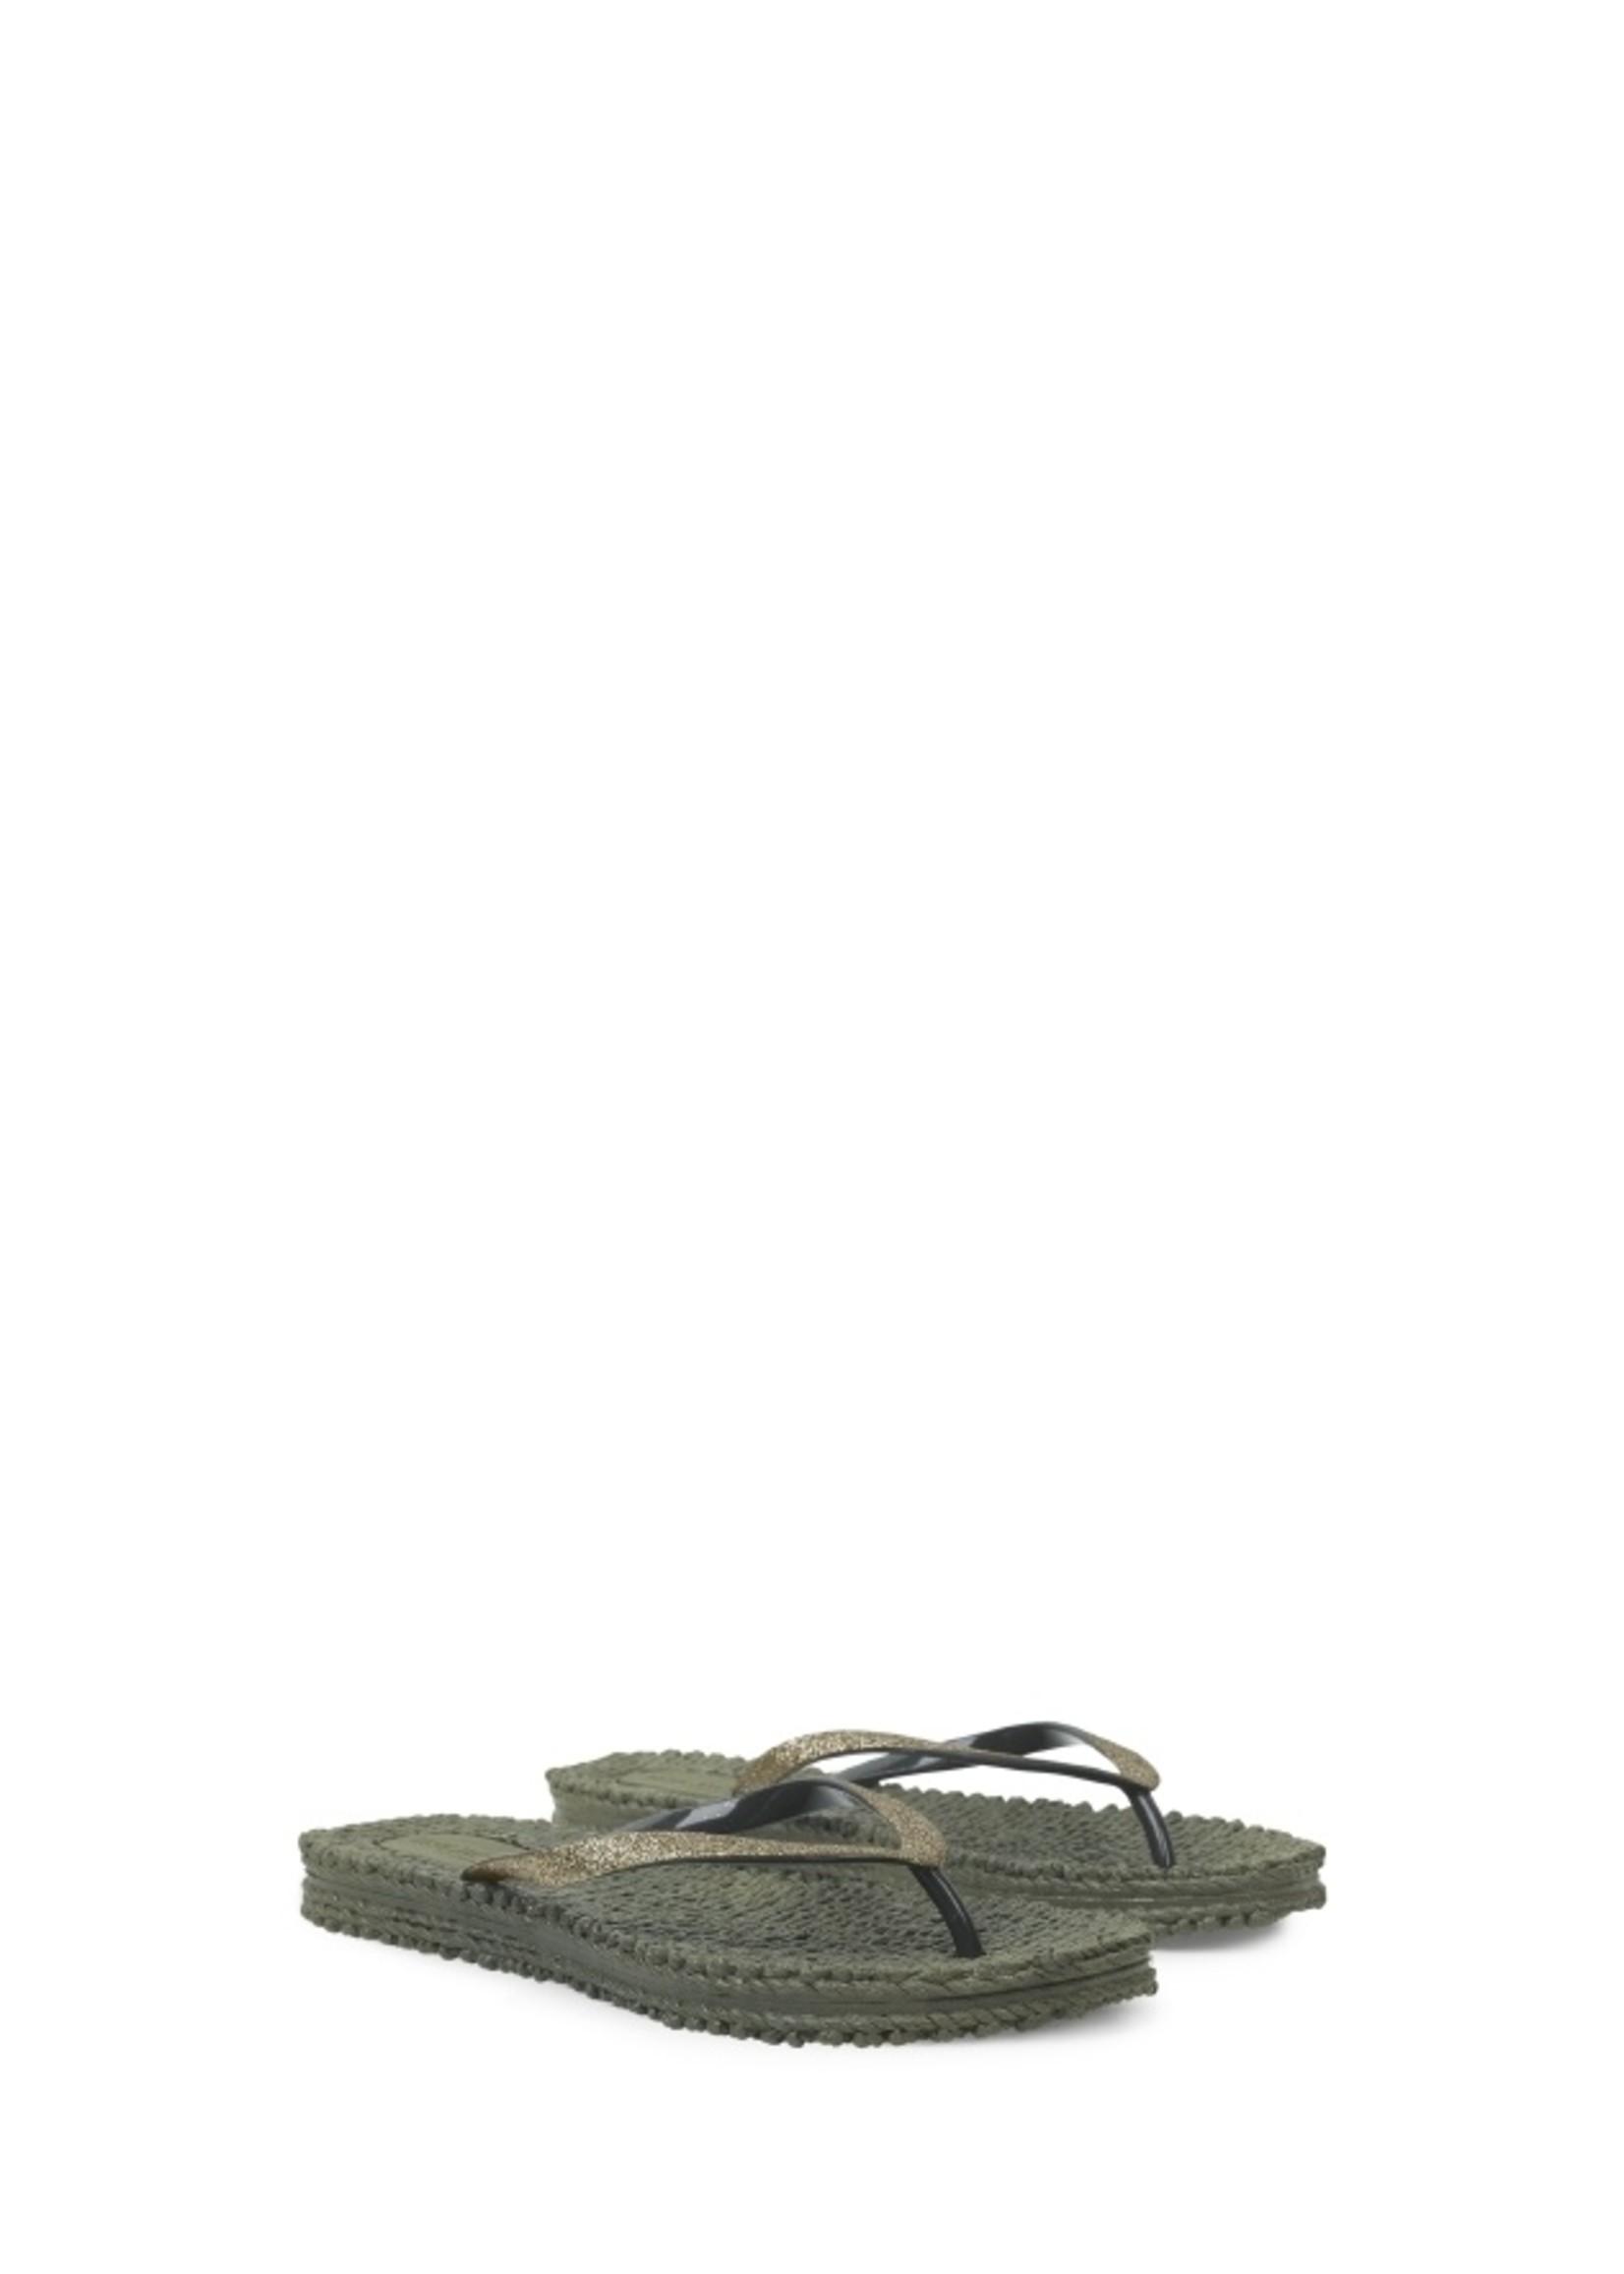 Ilse Jacobsen Cheerful Flip Flop - Army 37